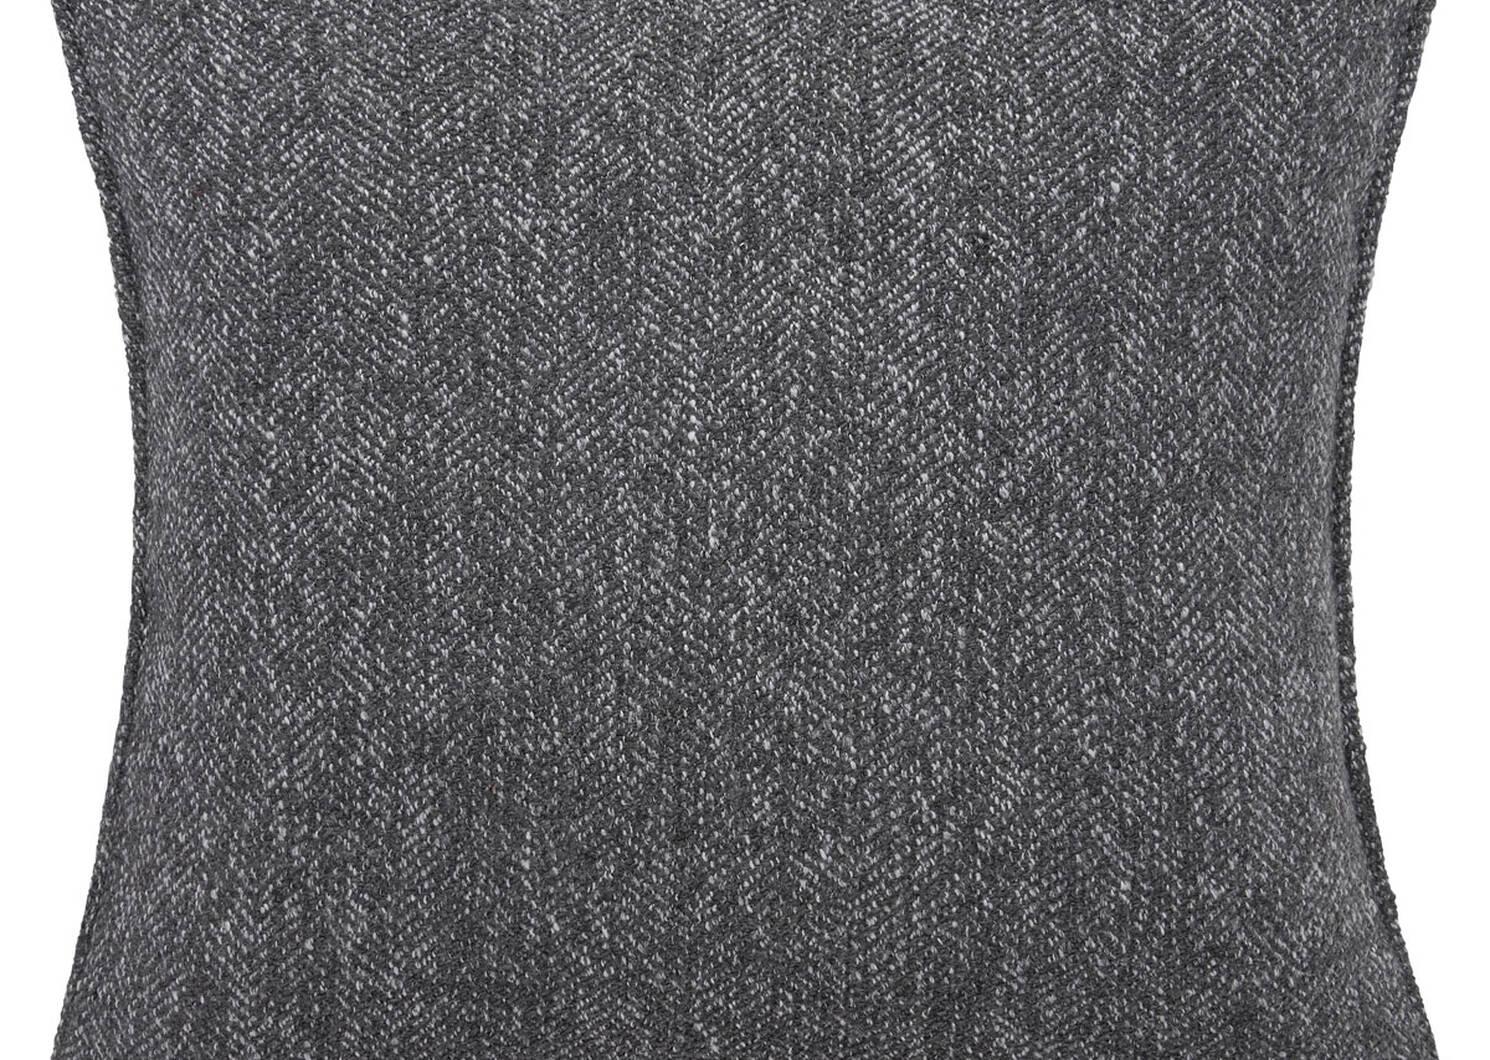 Calvet Toss 20x20 Dark Grey